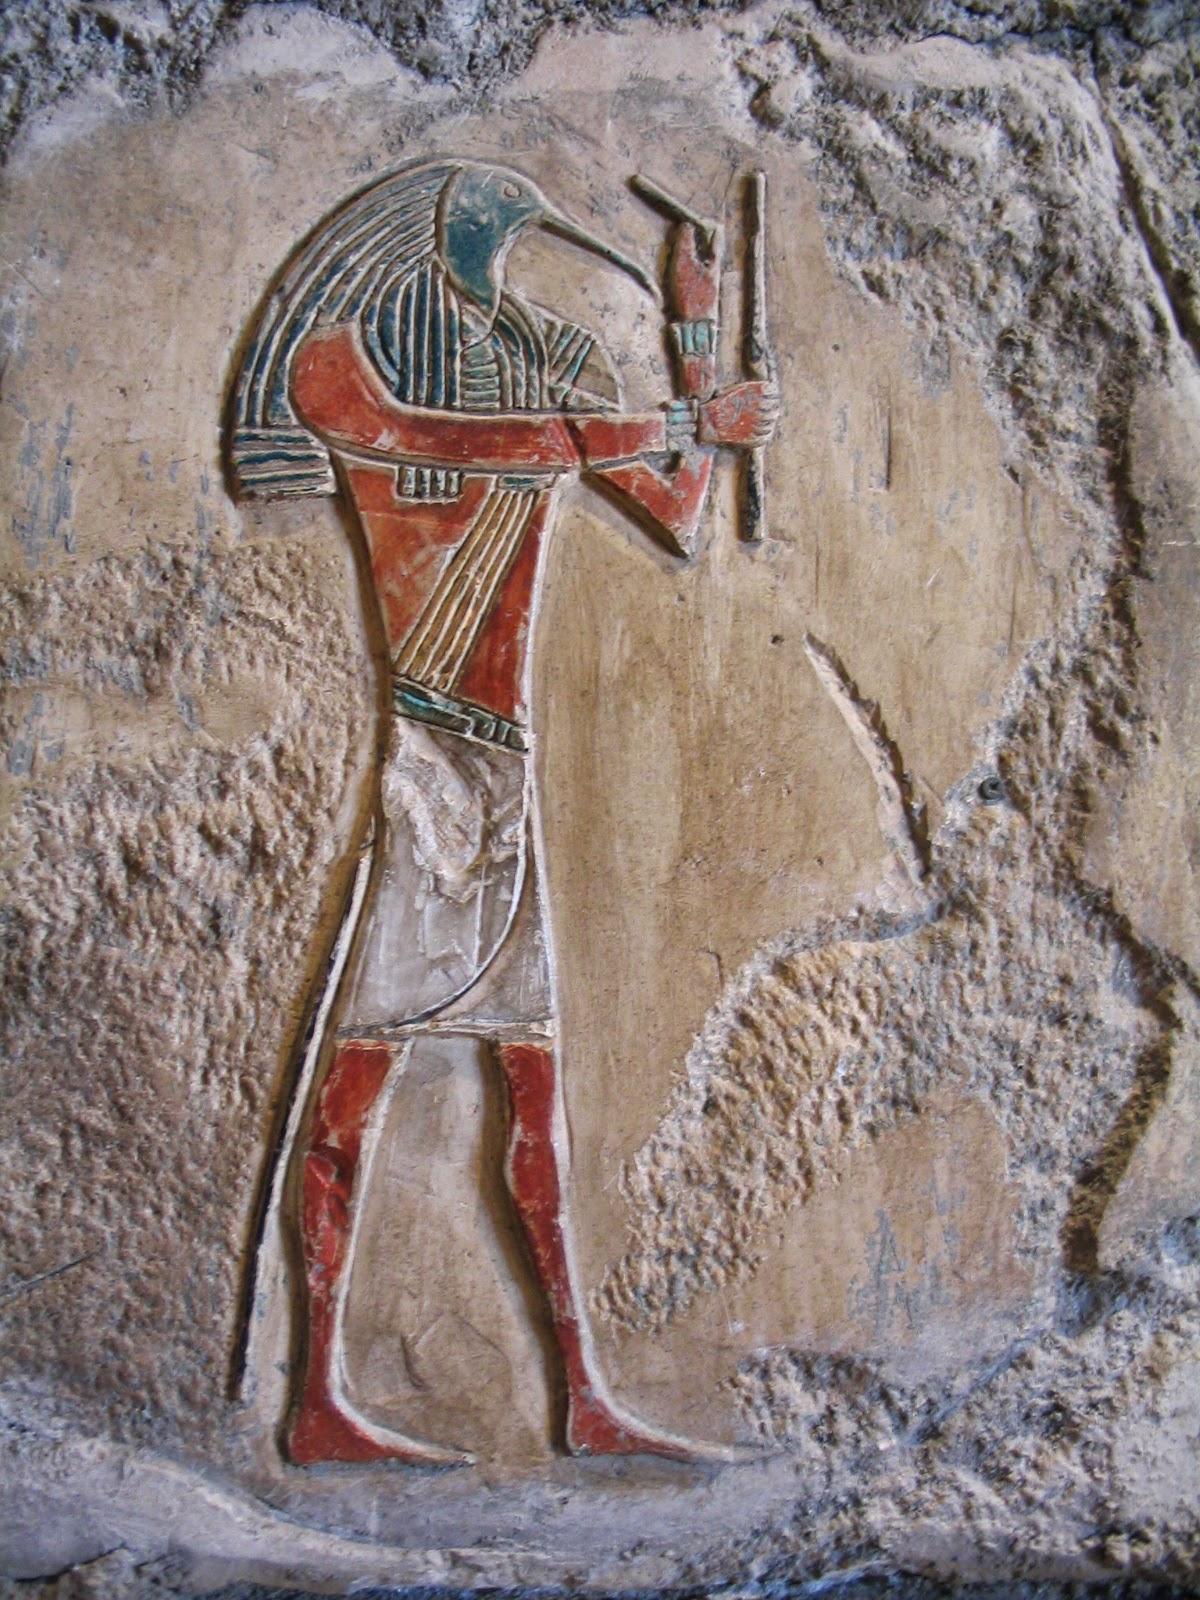 Olhar Cósmico: Quem Foi Hermes Trismegisto?